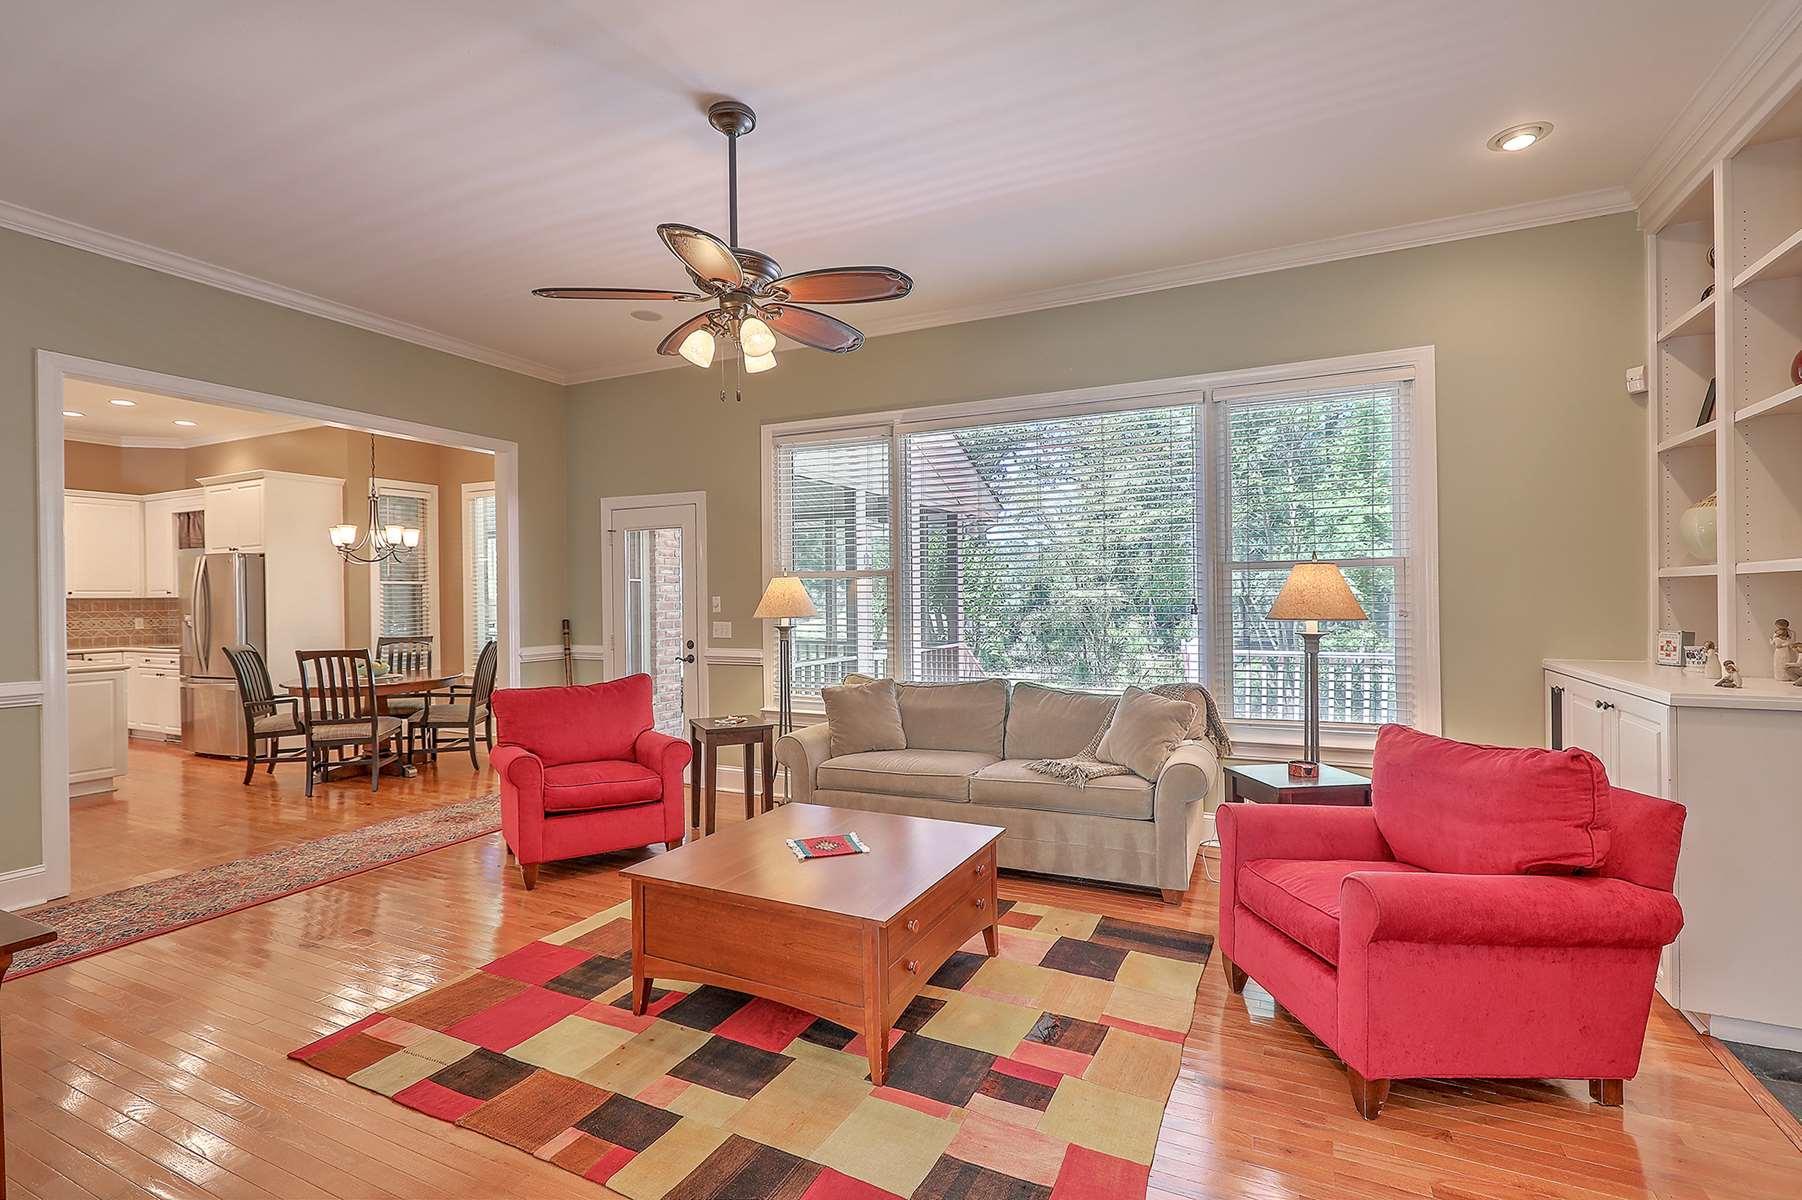 Dunes West Homes For Sale - 2961 Pignatelli, Mount Pleasant, SC - 1